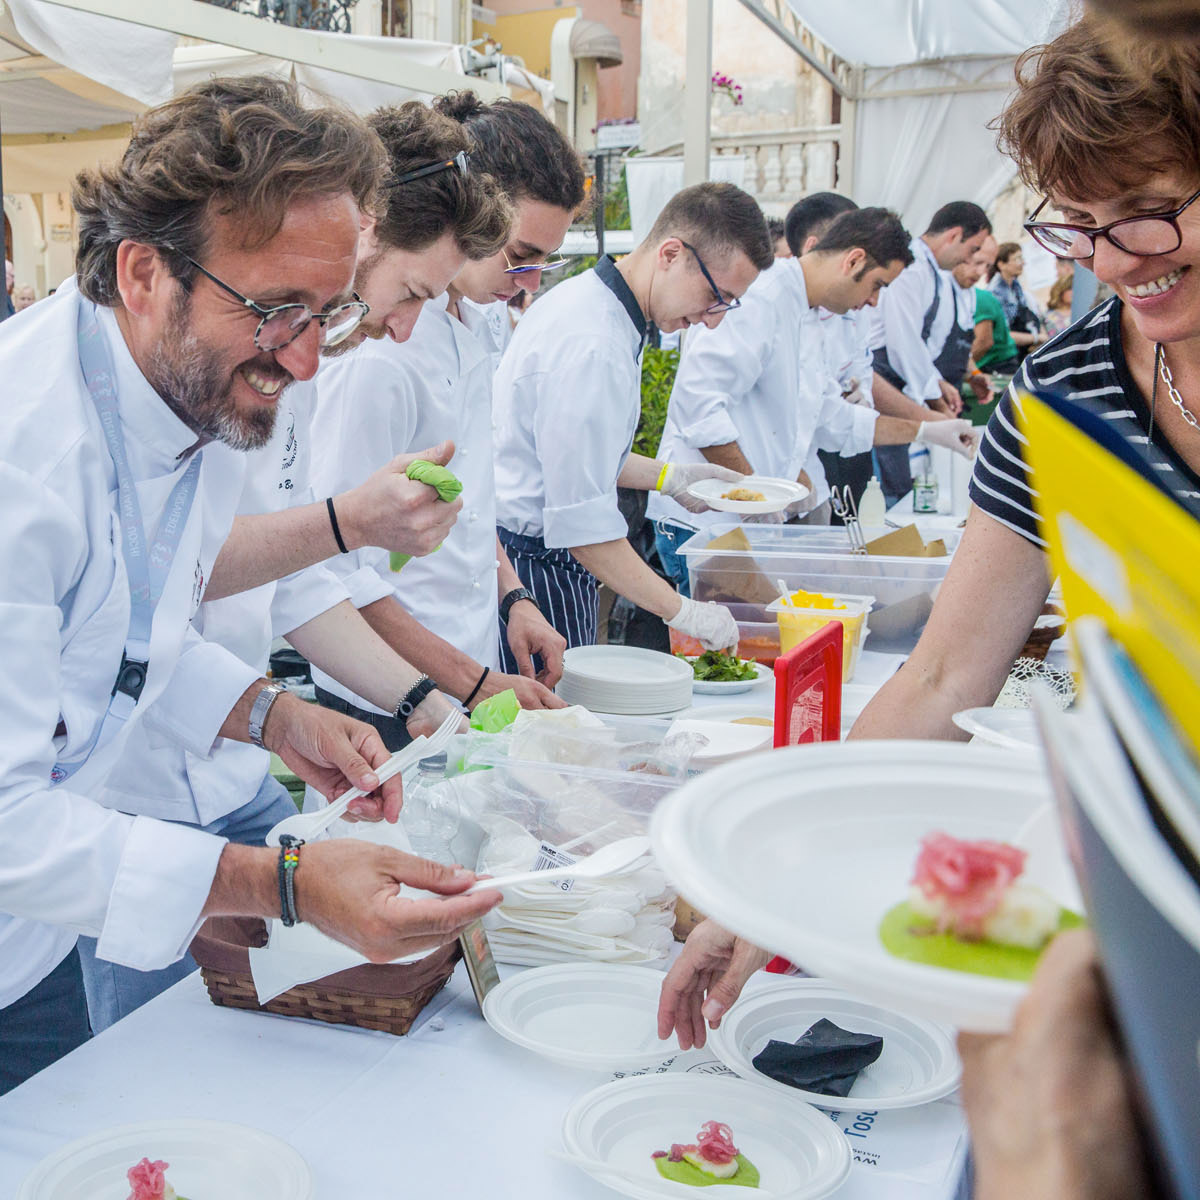 http://www.cibonostrum.eu/wp-content/uploads/2017/06/top-taormina-cooking-fest-gallery-thumb.jpg